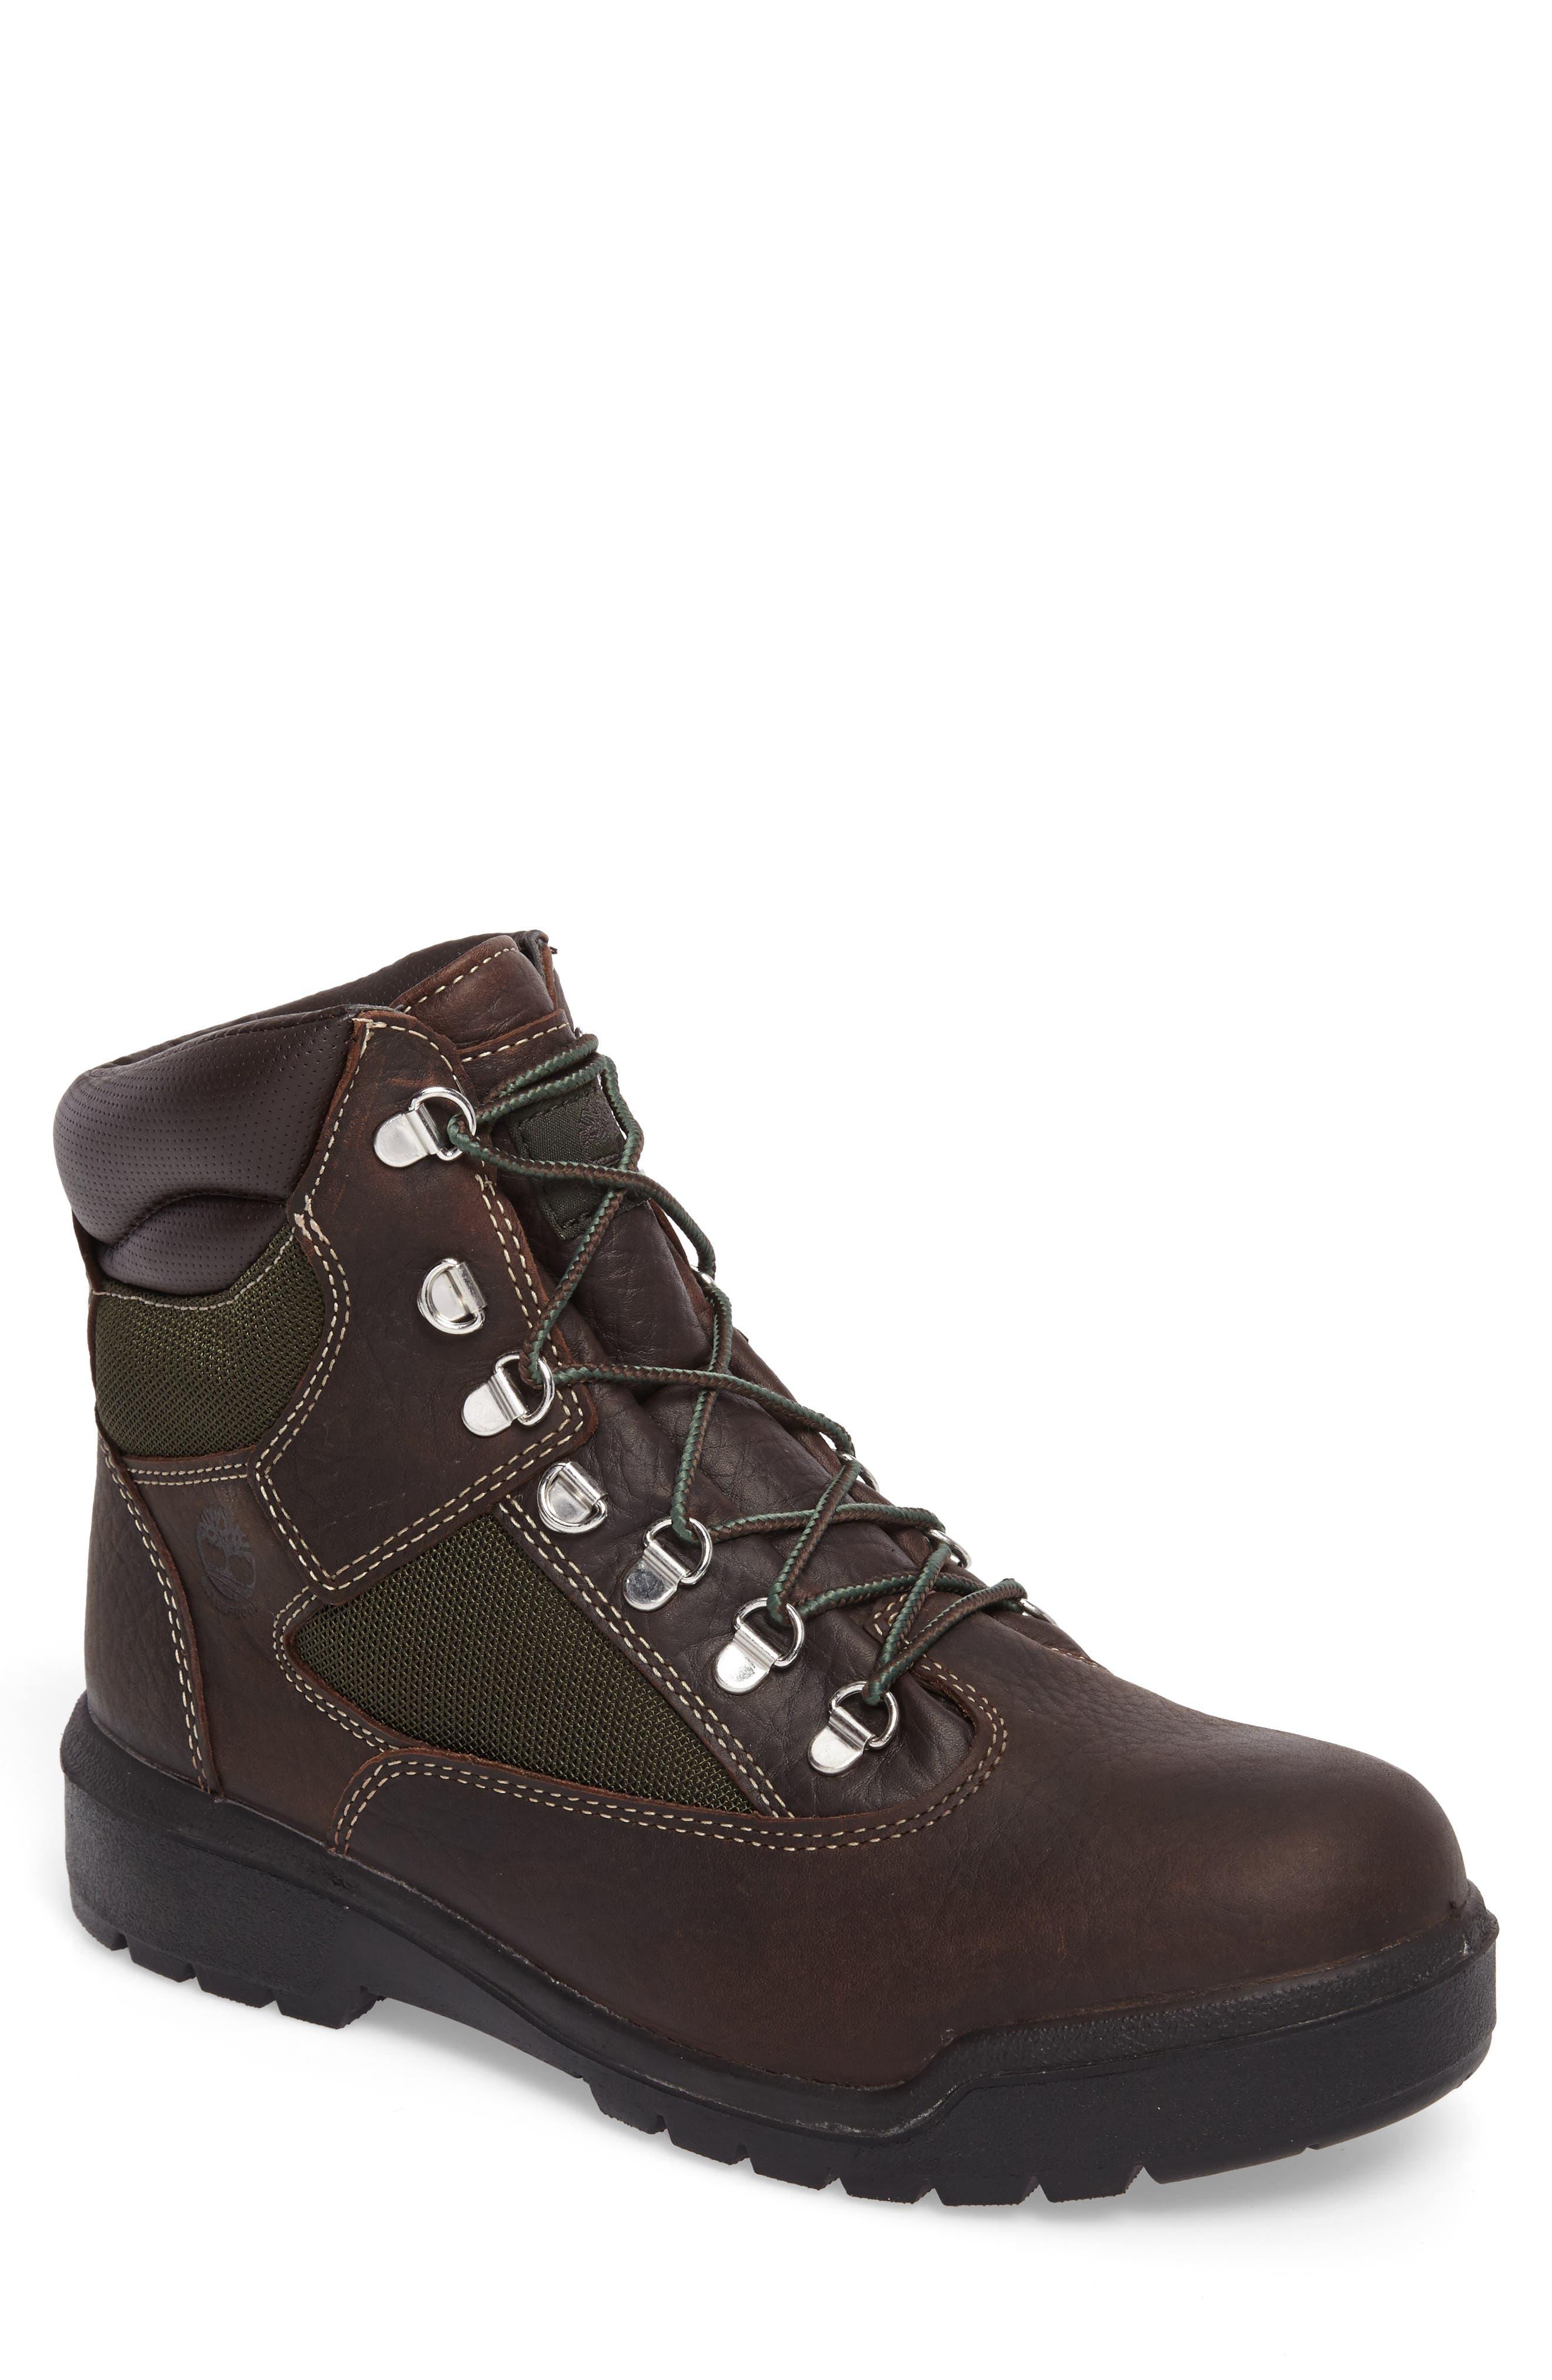 Field Waterproof Winter Boot,                         Main,                         color, Hazel Highway Leather